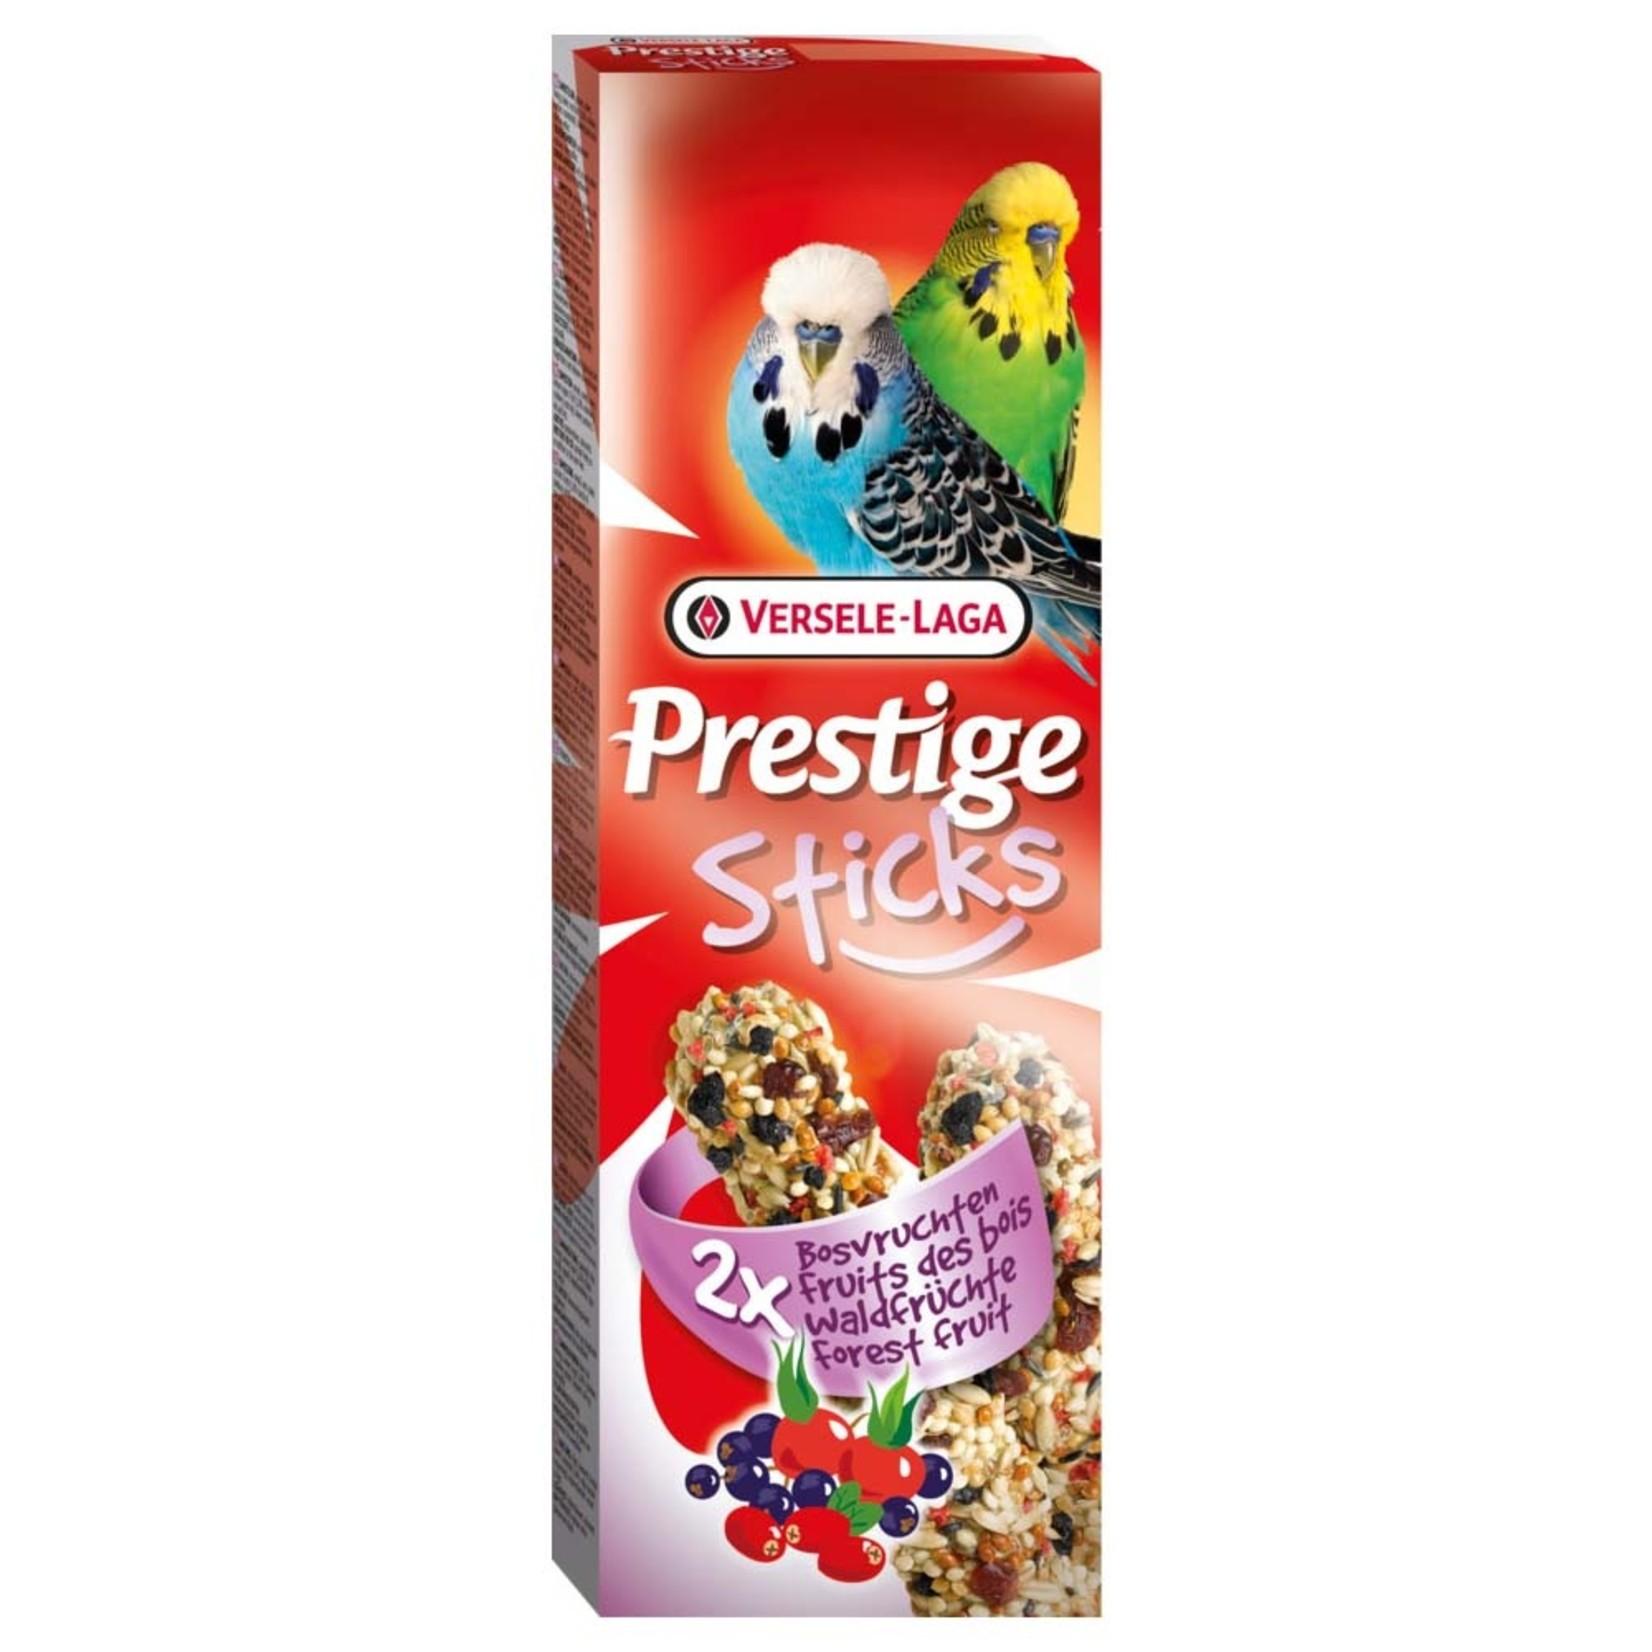 Versele-Laga Prestige sticks for Parakeets 2x30g